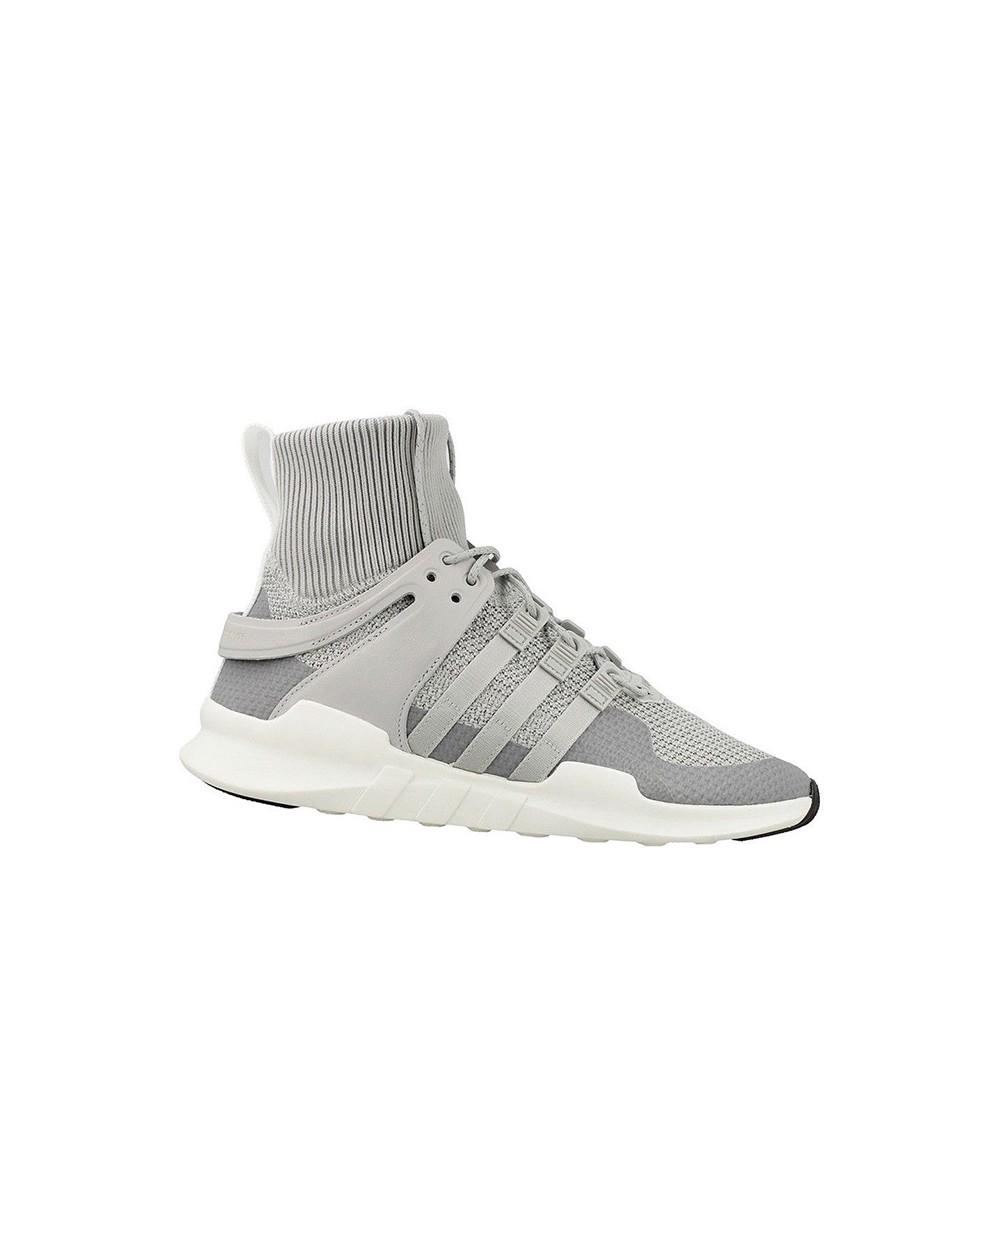 Adidas Originals EQT Support ADV Winter Sneaker (BZ0641)